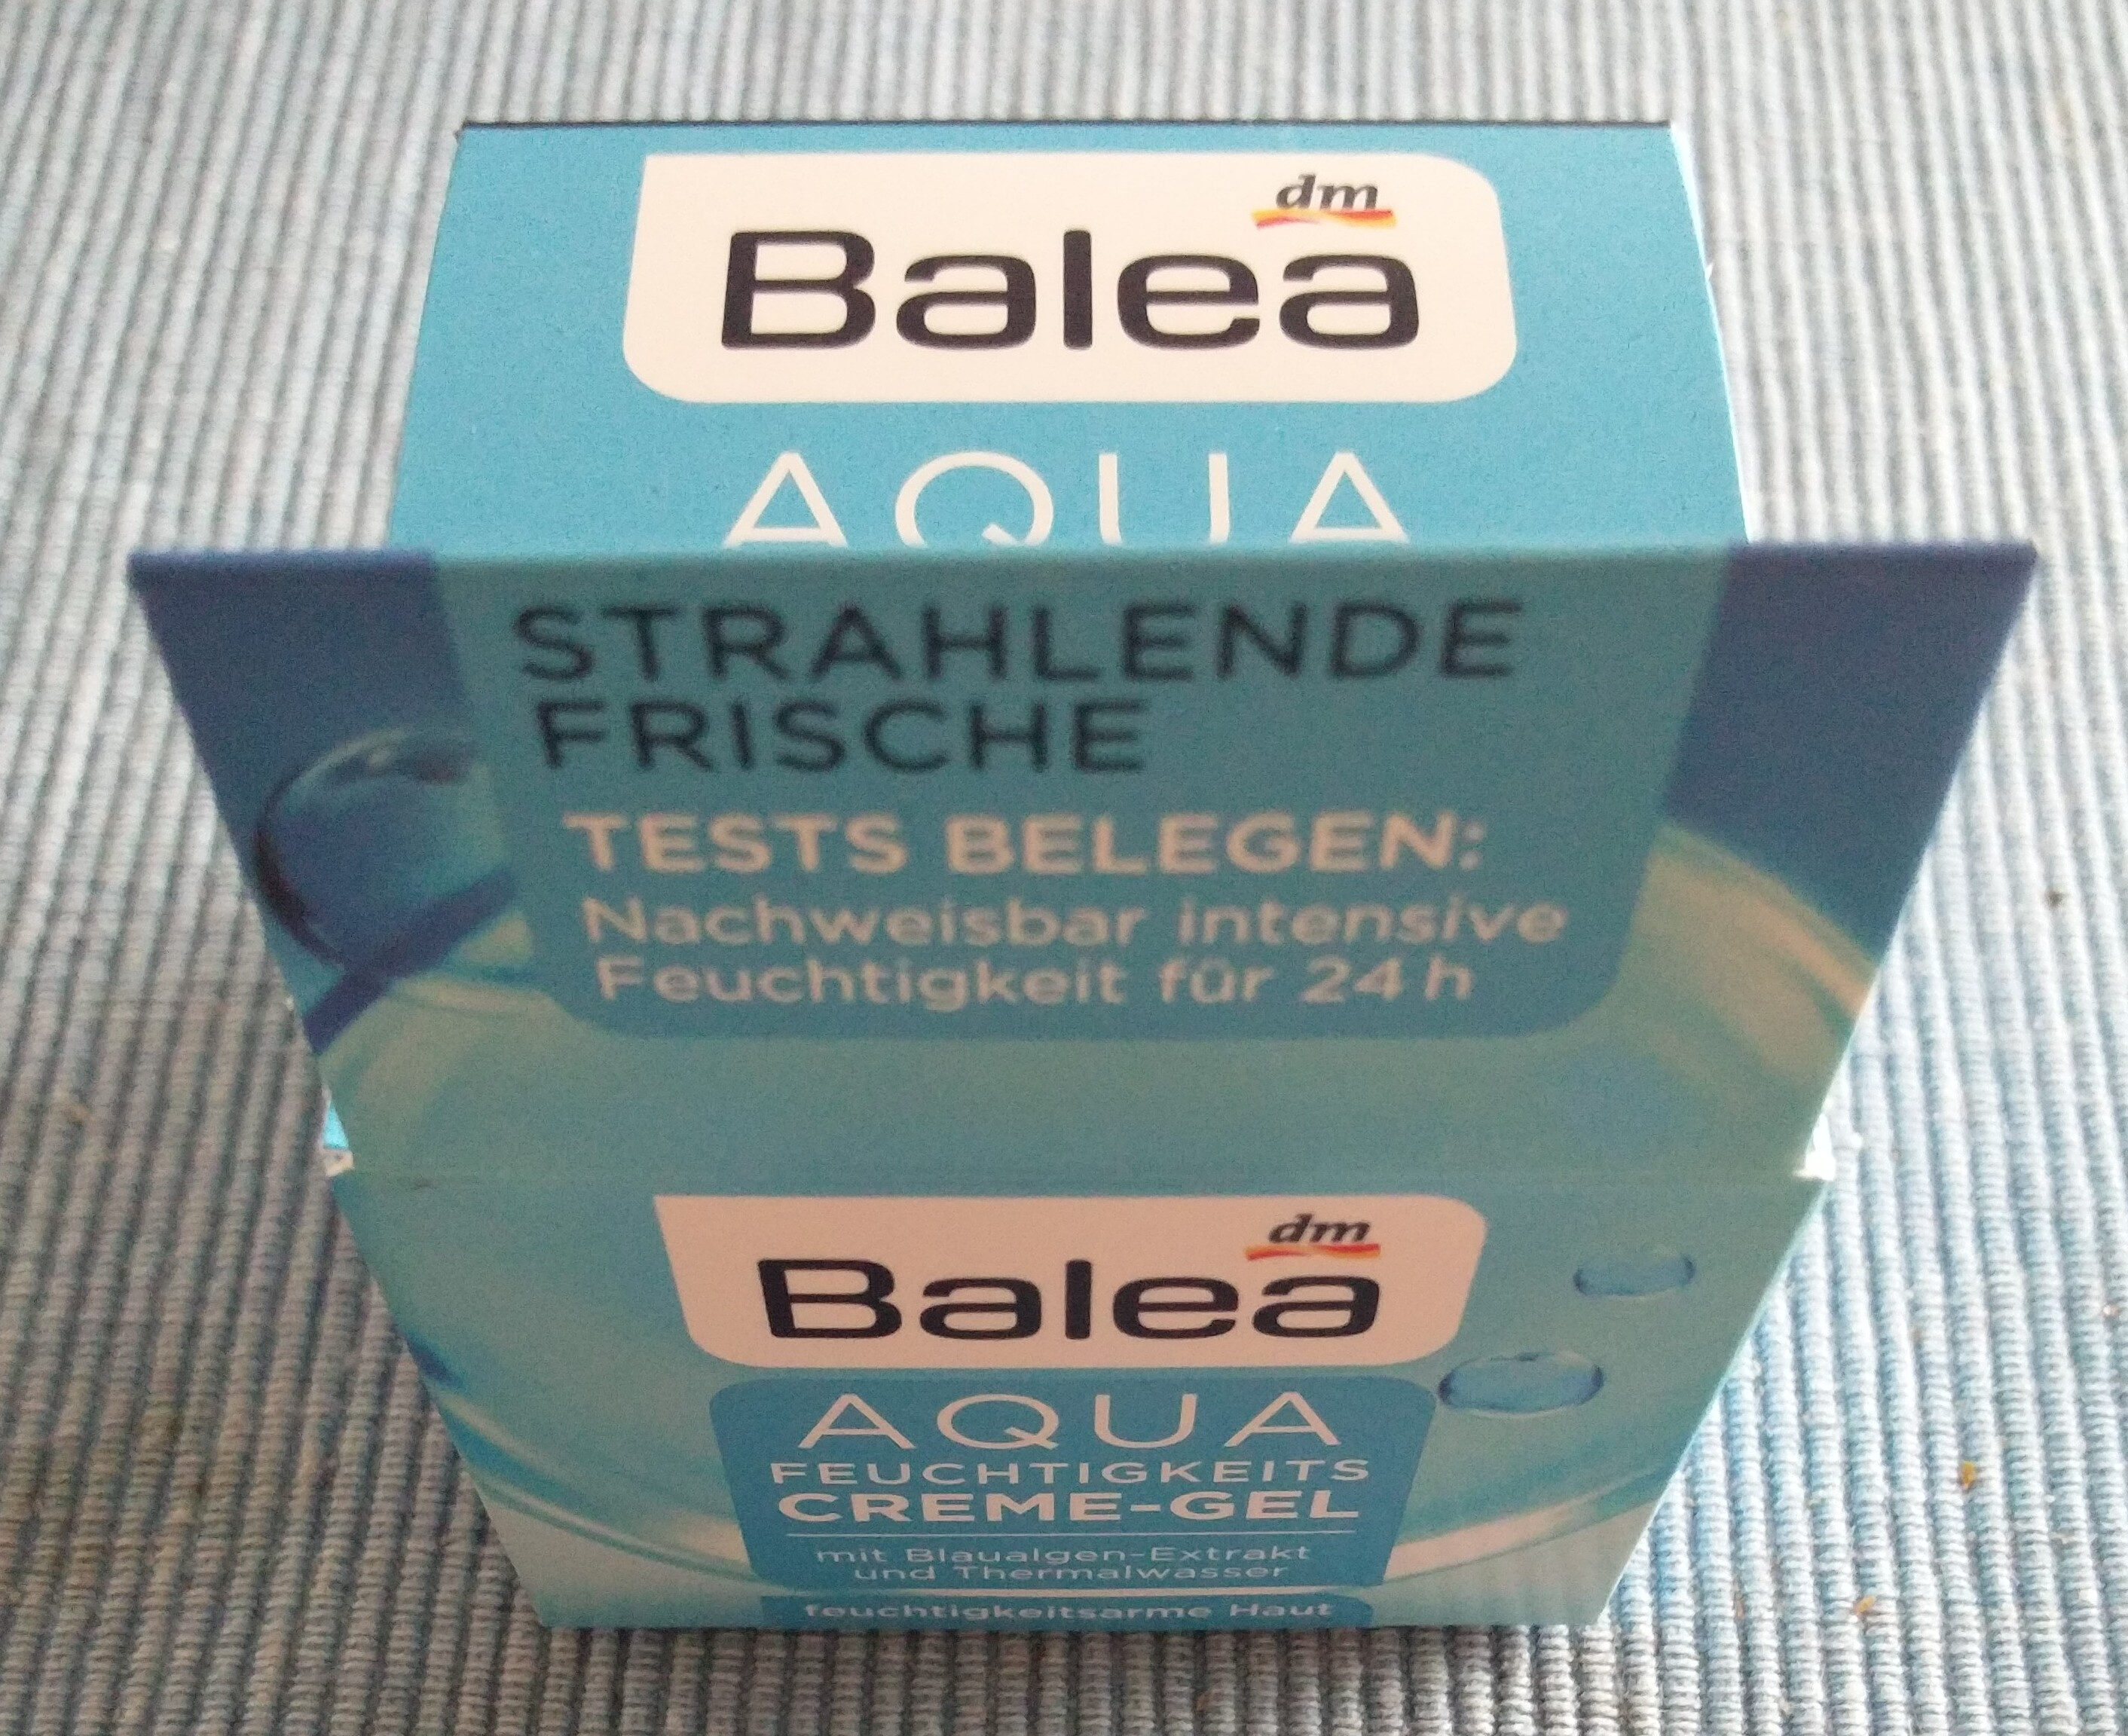 Aqua Feuchtigkeits Creme-Gel - Продукт - de